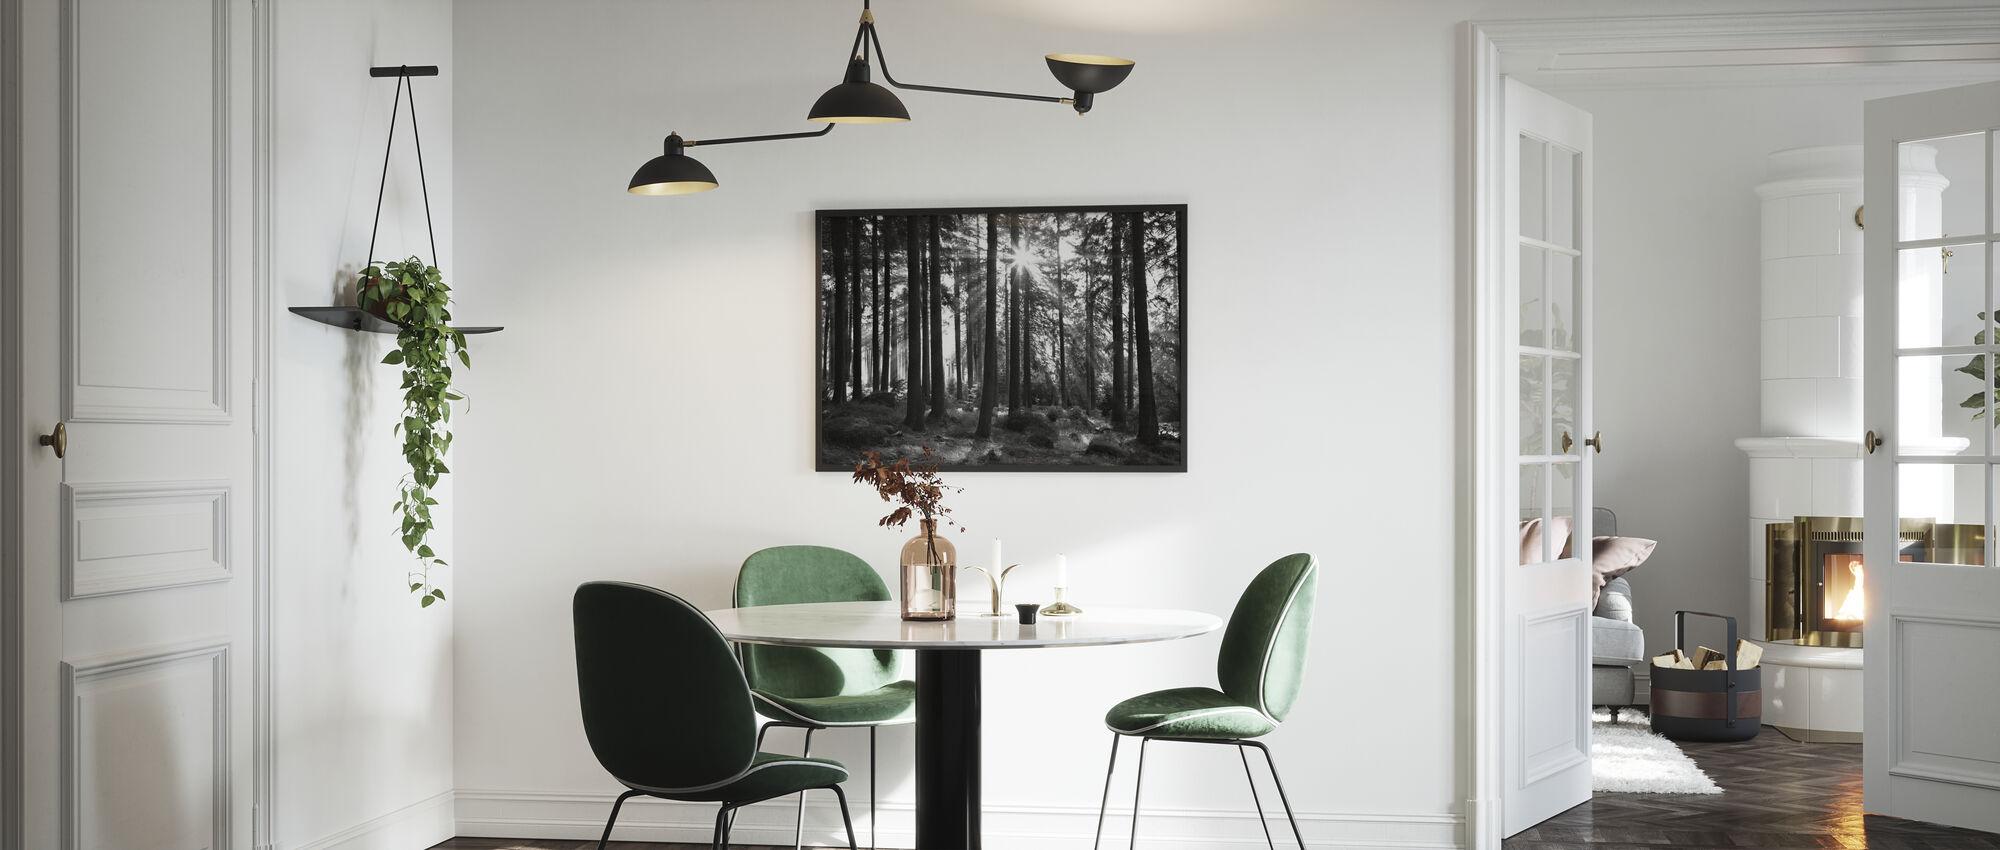 Sunbeam through Trees - Poster - Kitchen